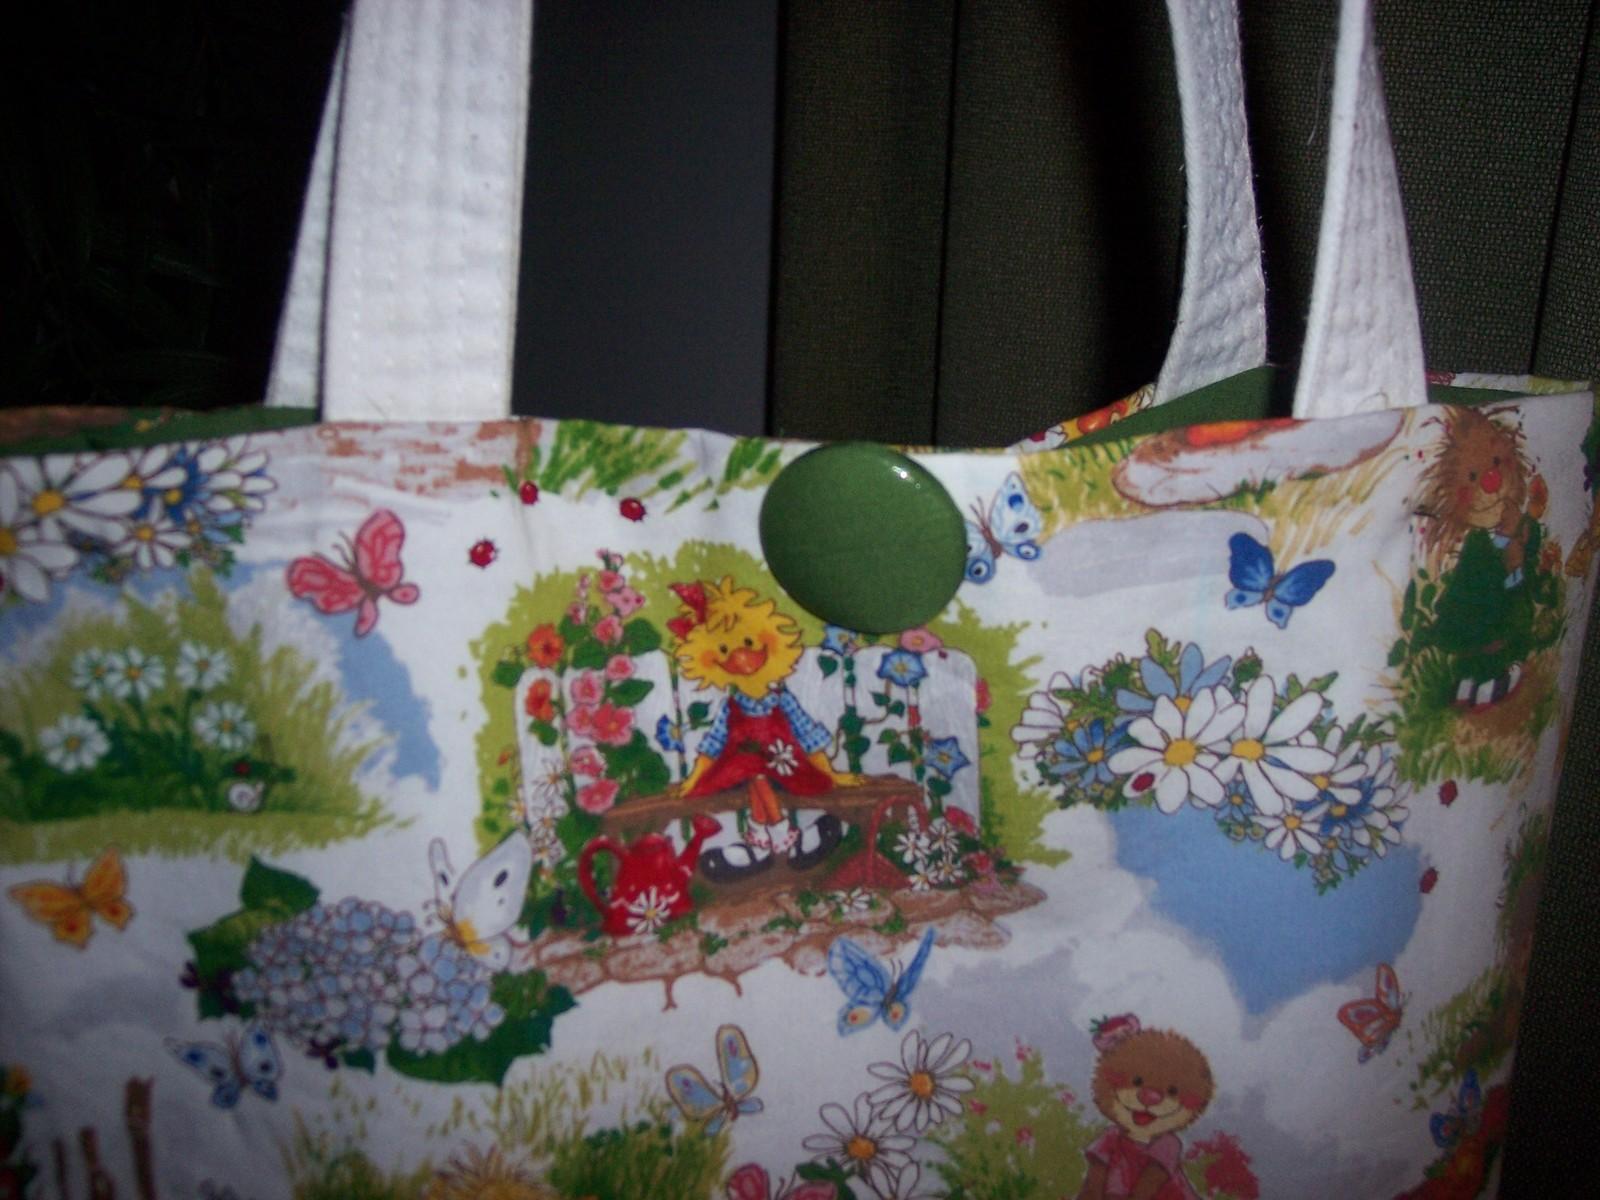 Suzy's Zoo Tote Bag Shopper Cute Spring Scene Handmade Christmas Gift!